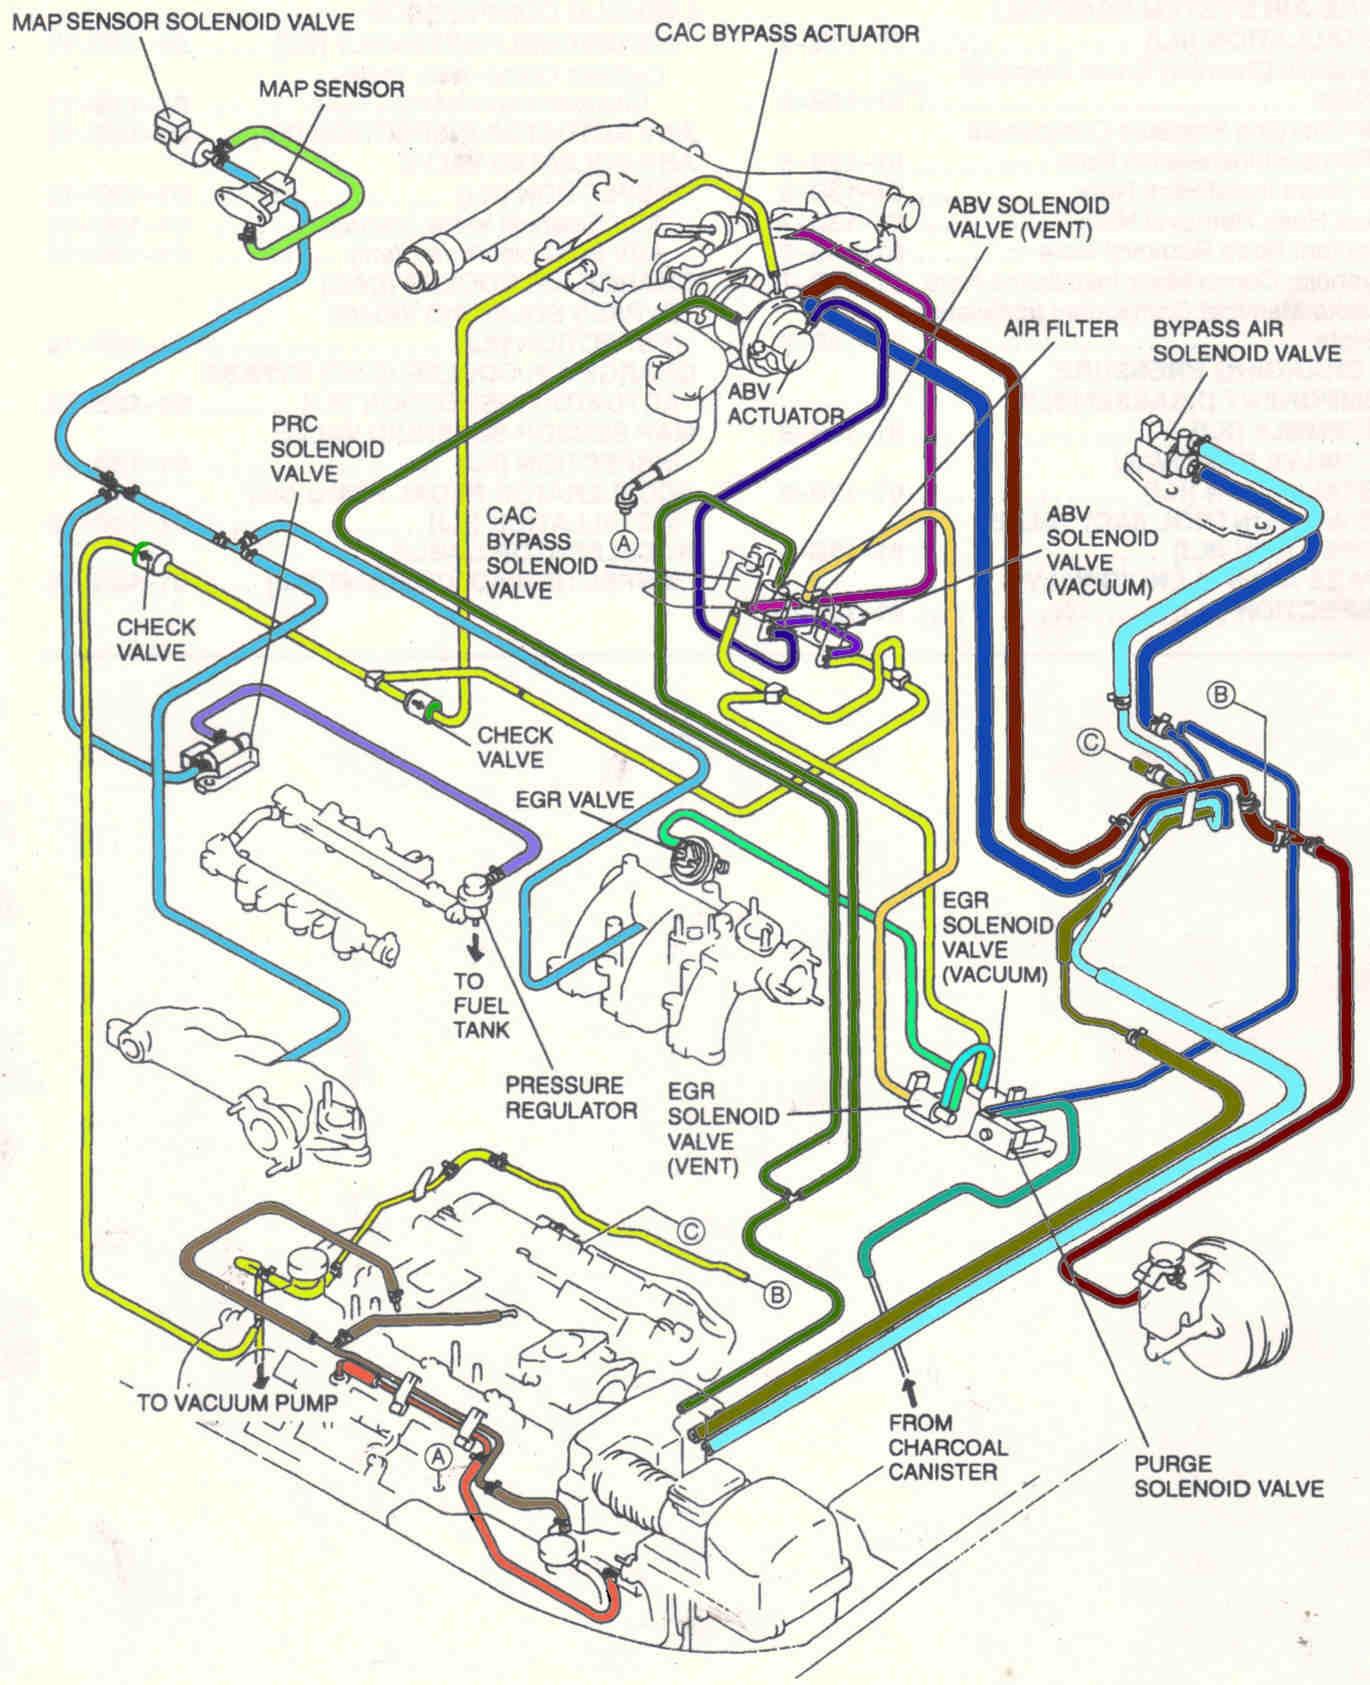 Mazda Mpv 2001 Engine Diagram How To Replace A Coolant Temperature 2005 6 2000 Millenia S Rmp Won T Pass Forum